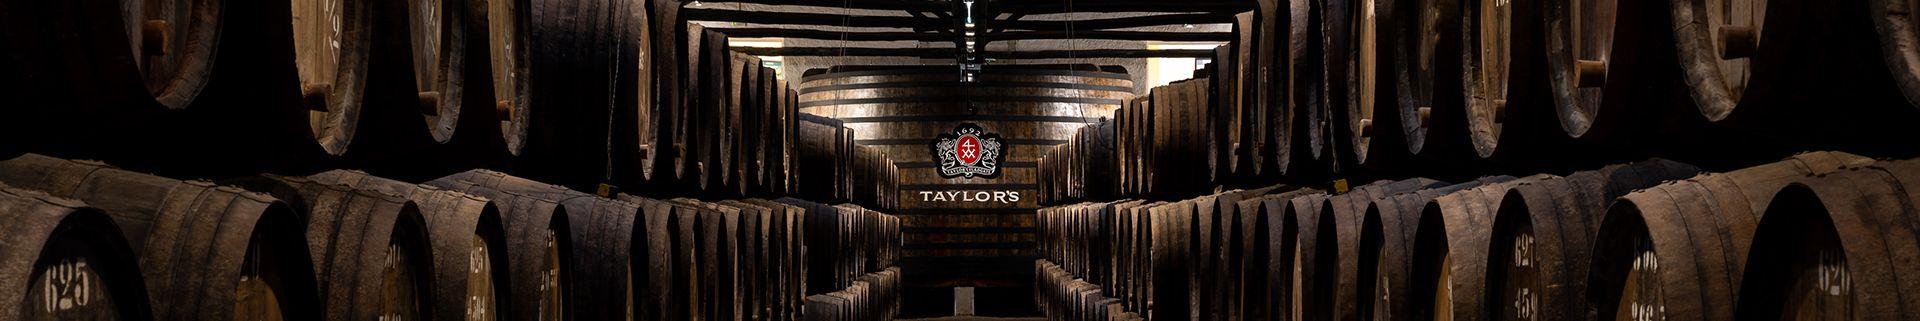 Visit Taylor Fladgate Cellars in Porto, Portugal